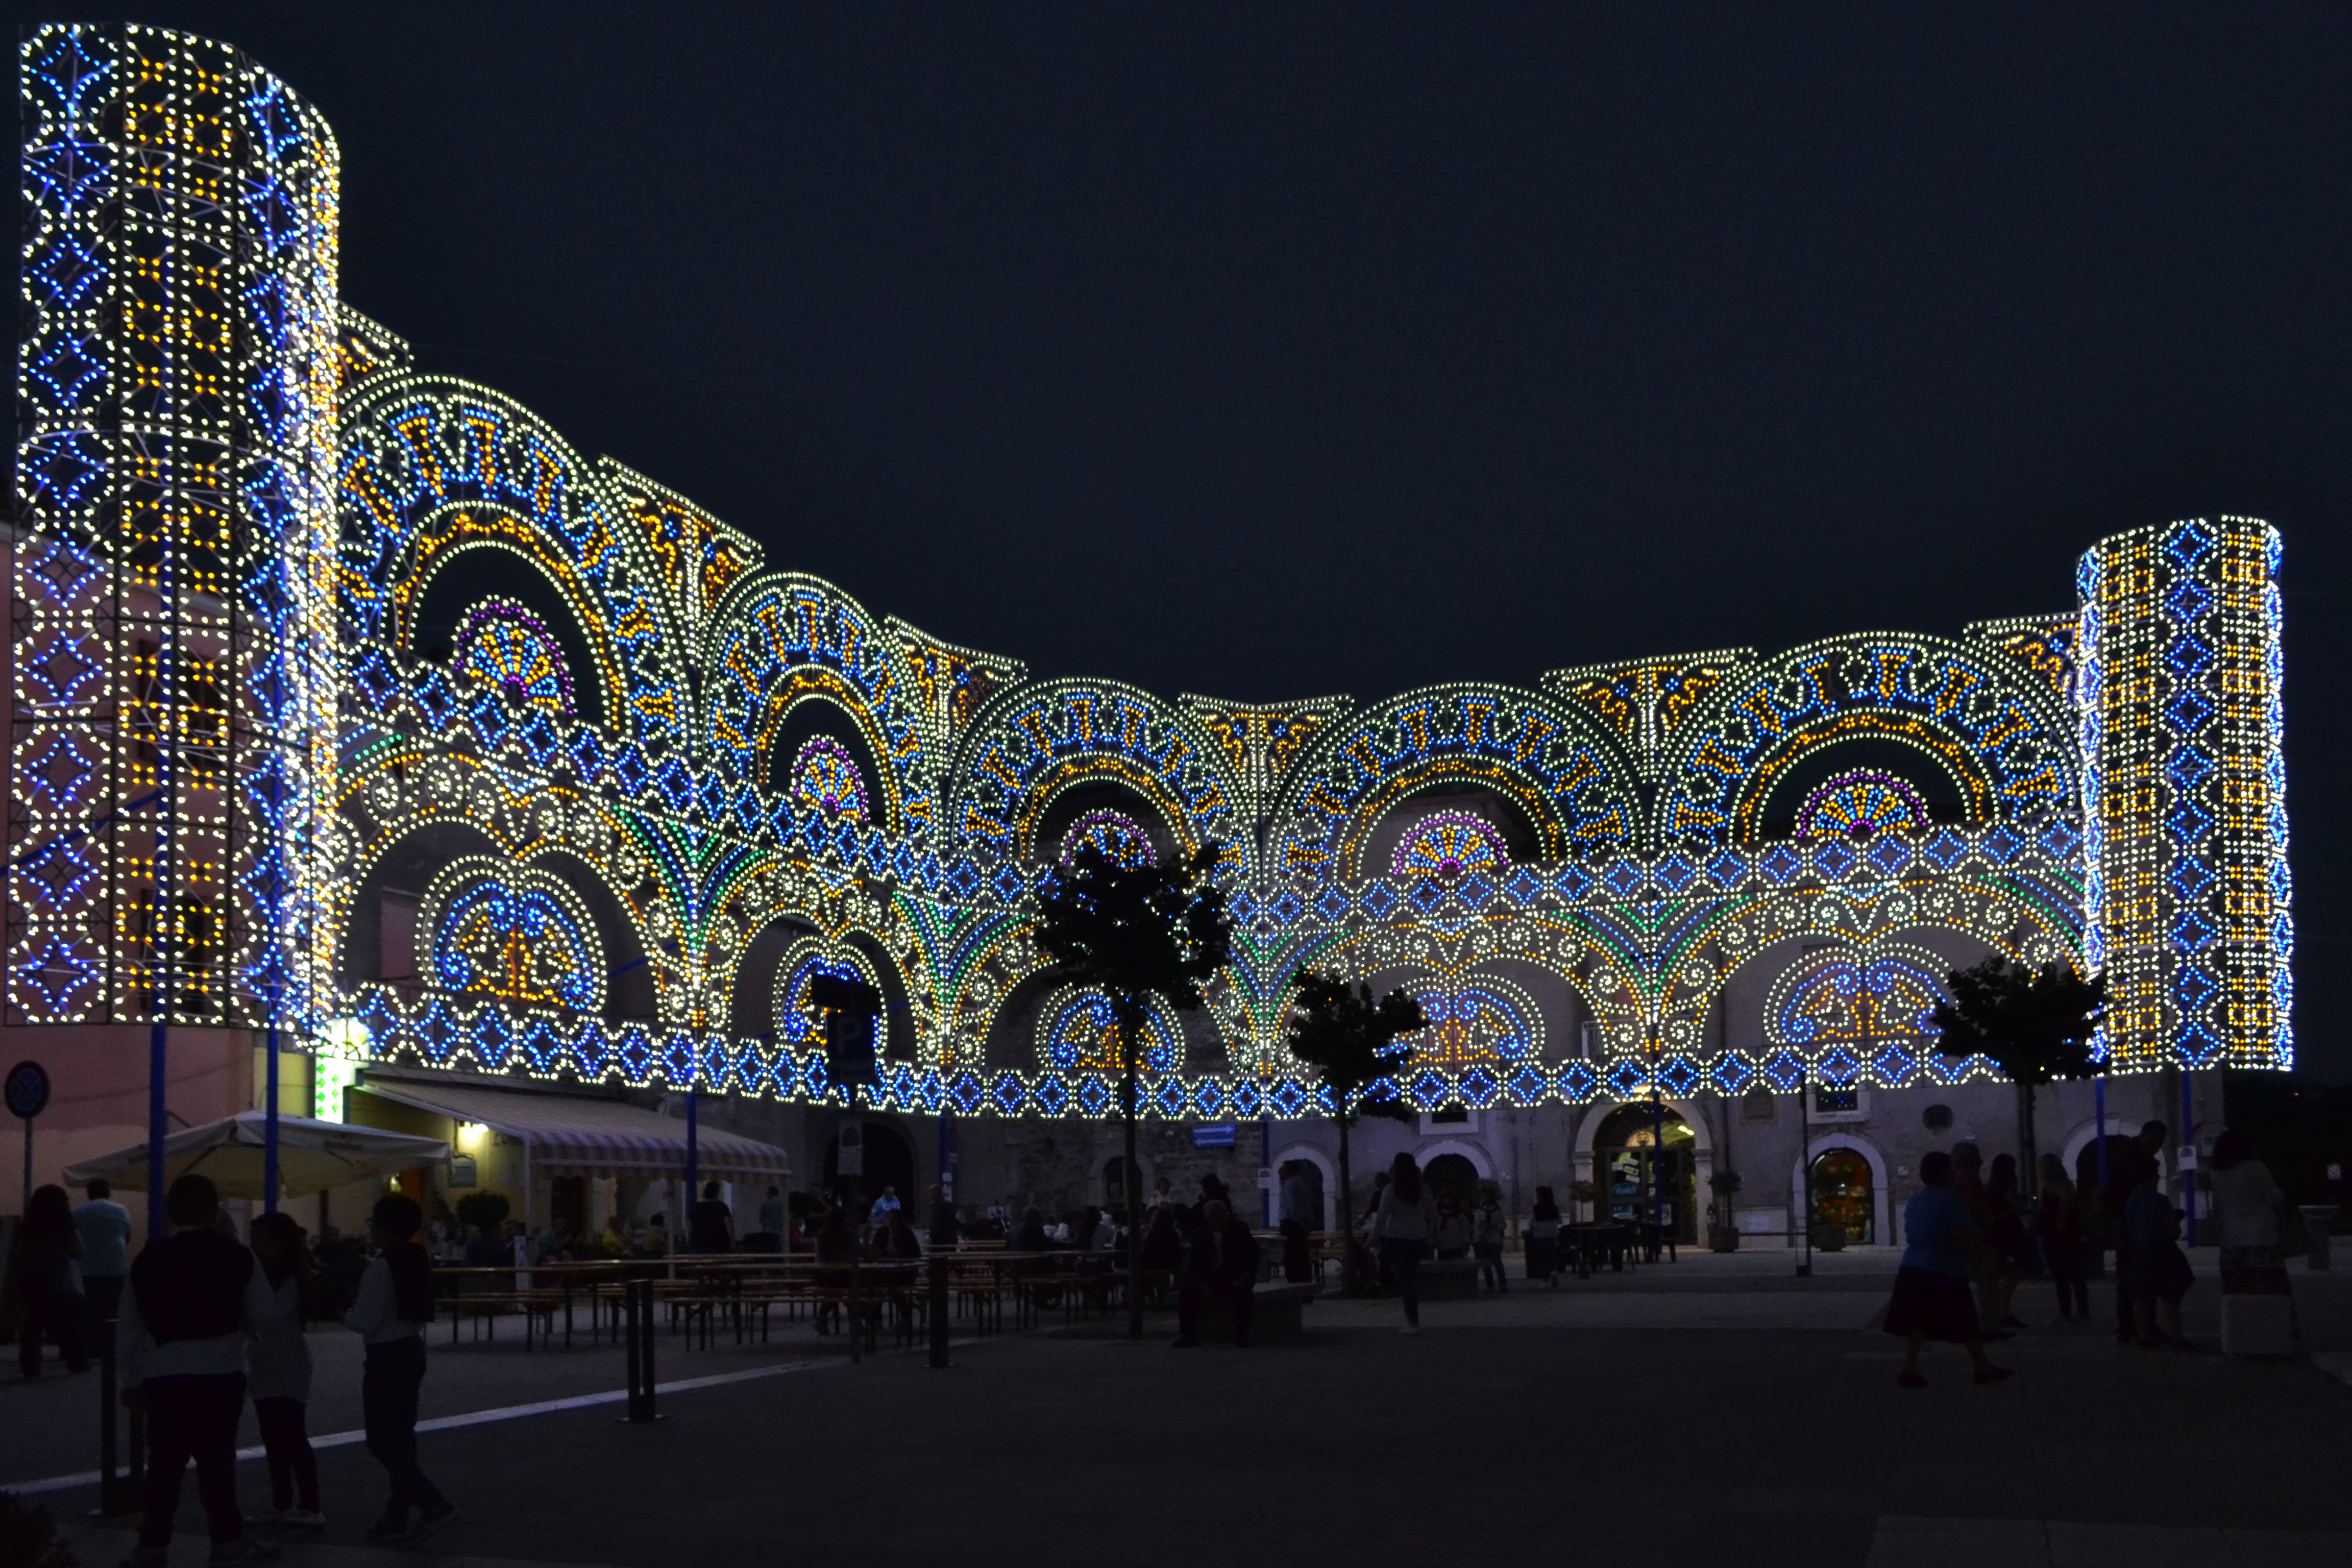 napoli luminarie natale in piazza